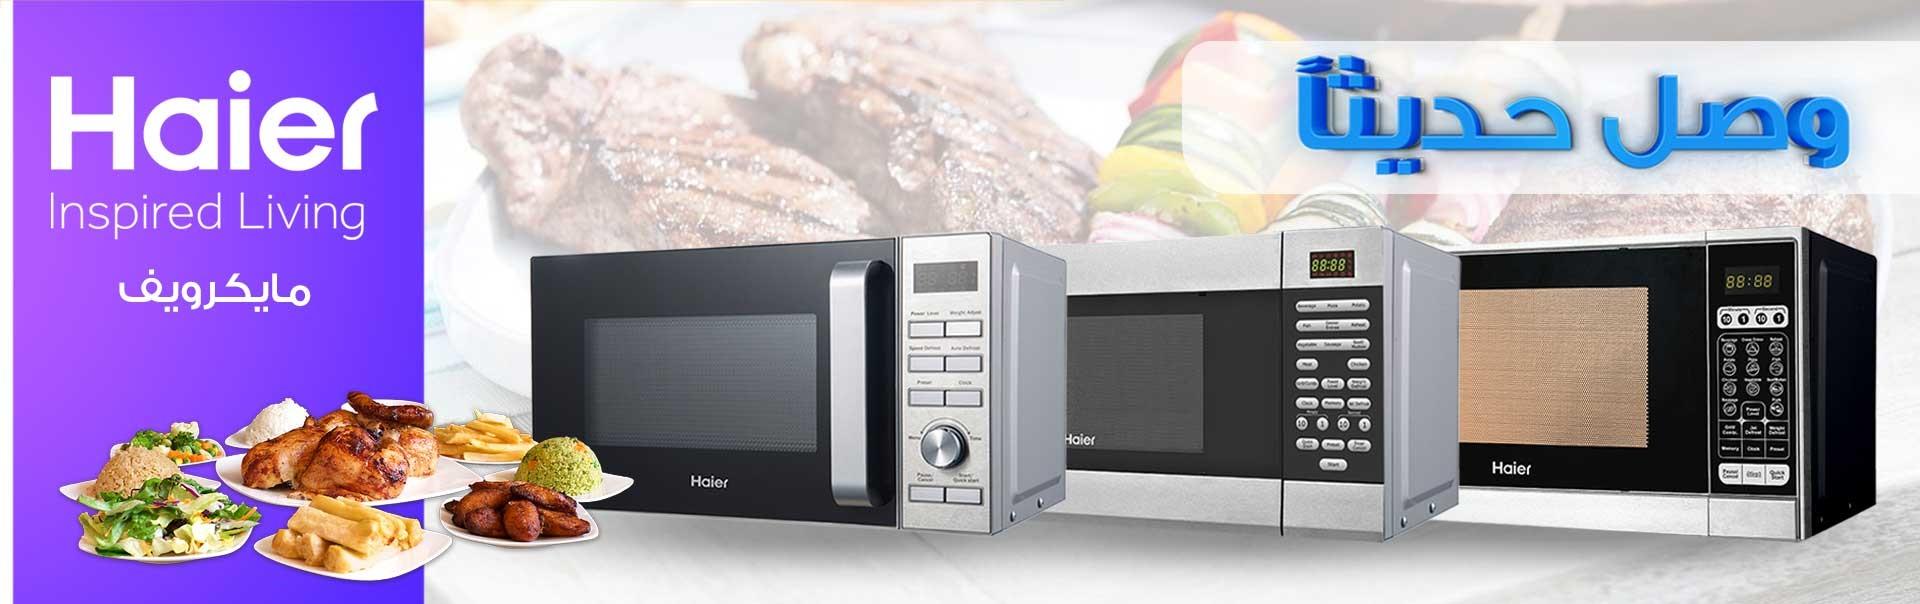 Haier Microwaves